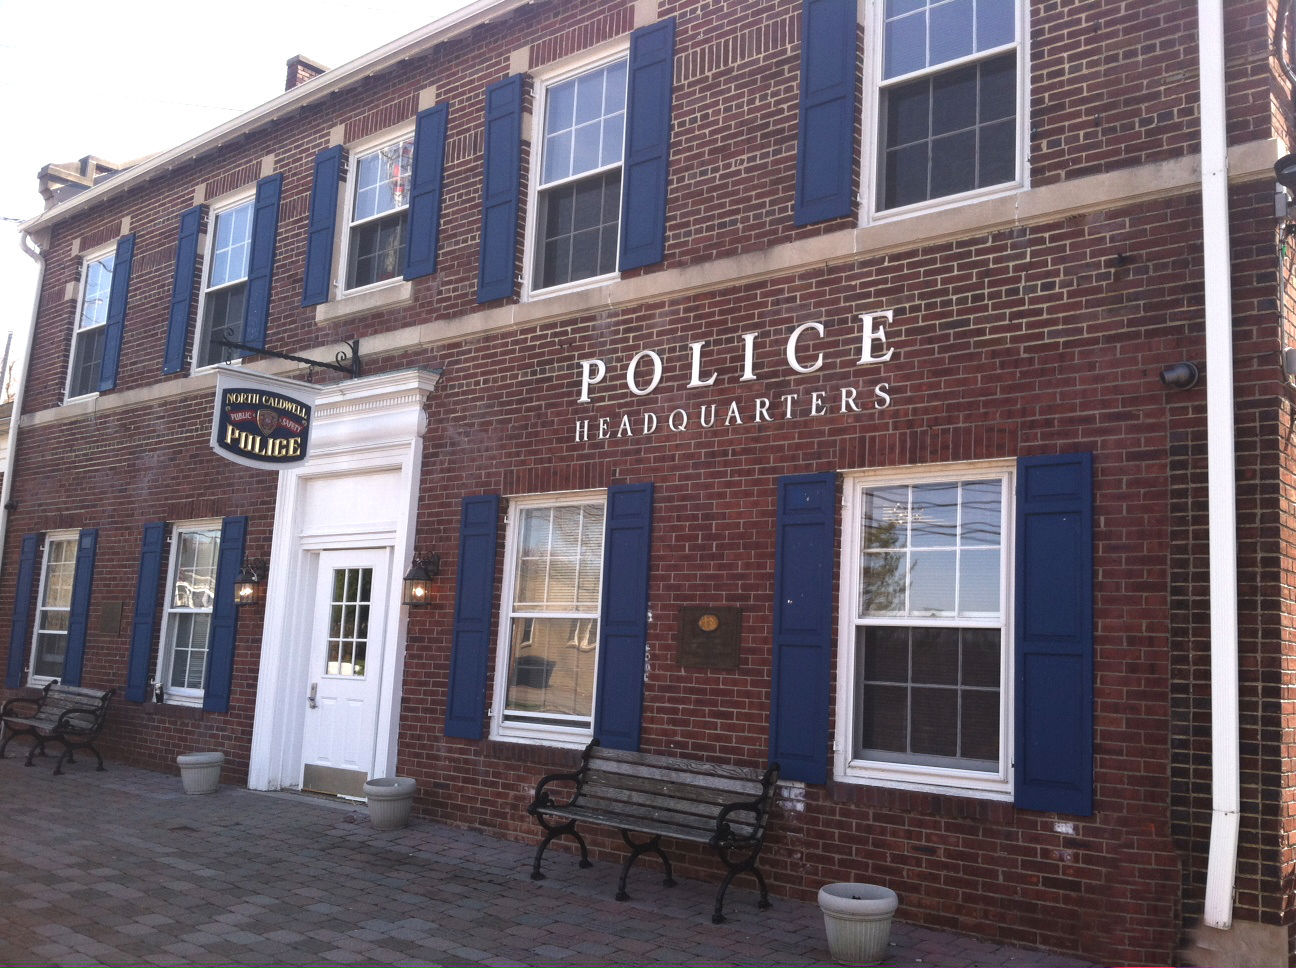 9dcd149d27ae97afd1e8_police_station_2_by_Carolyne_Curley.jpg